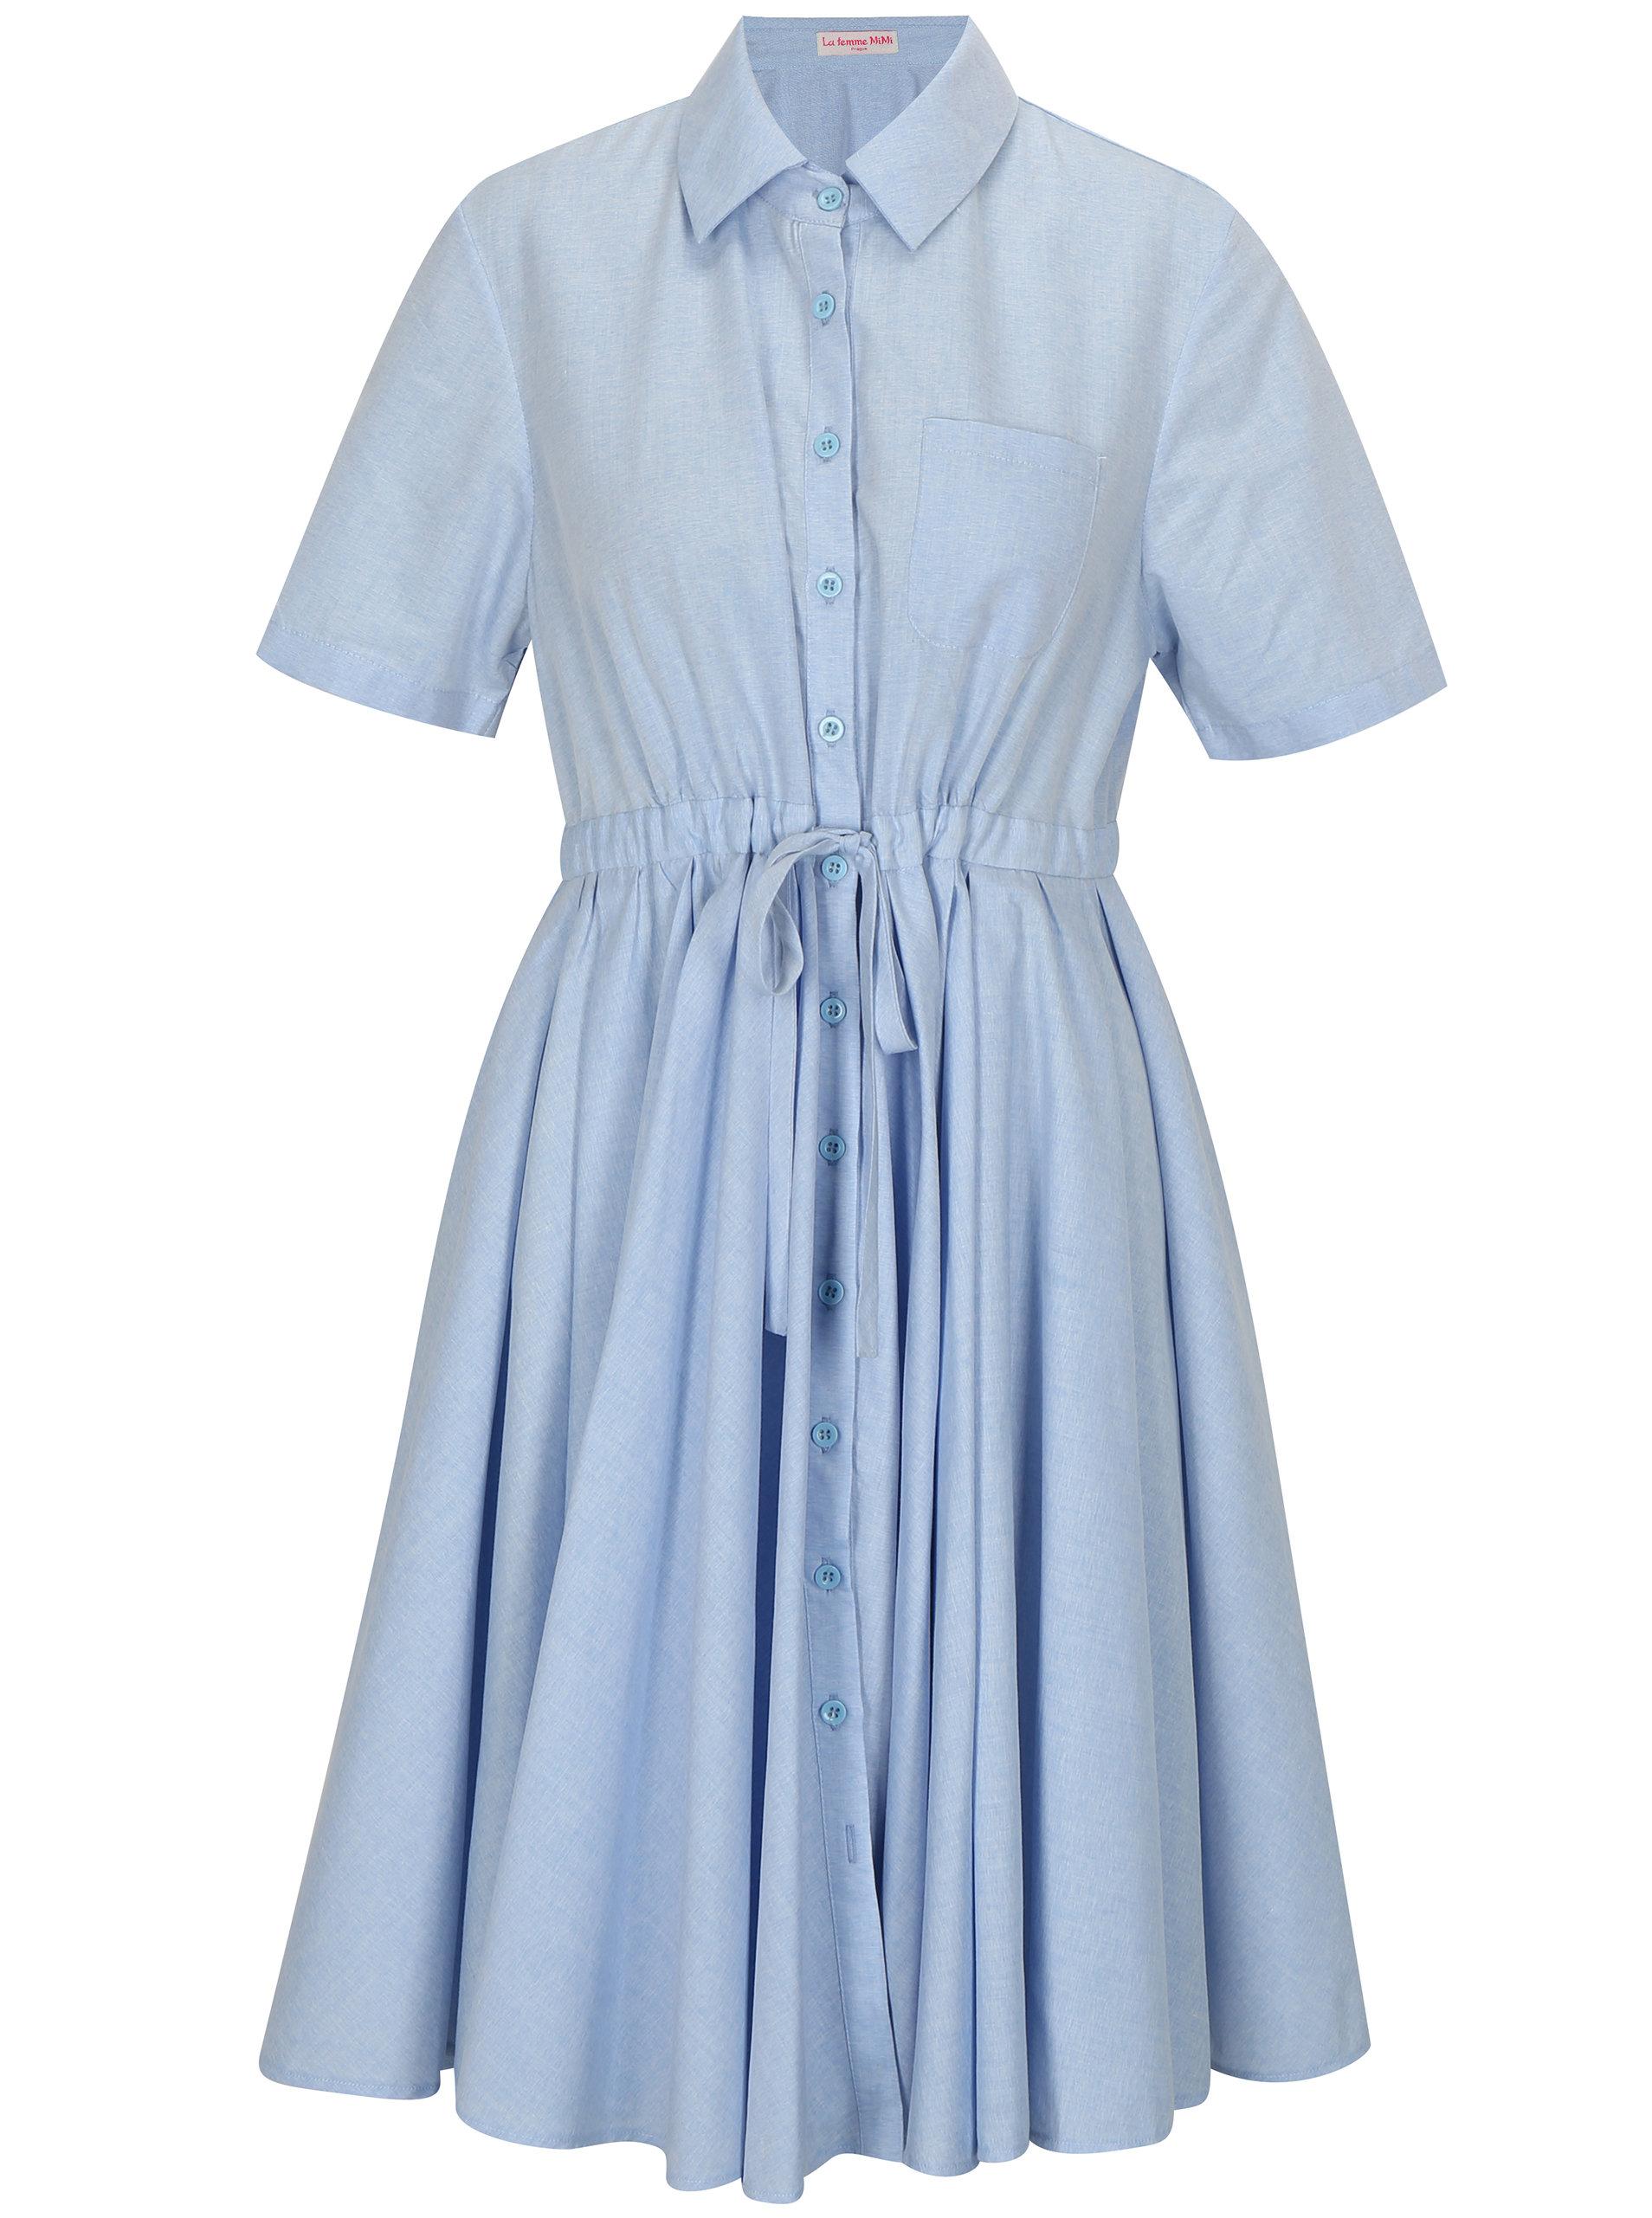 94da91ee9f38 Svetlomodré košeľové šaty La femme MiMi ...